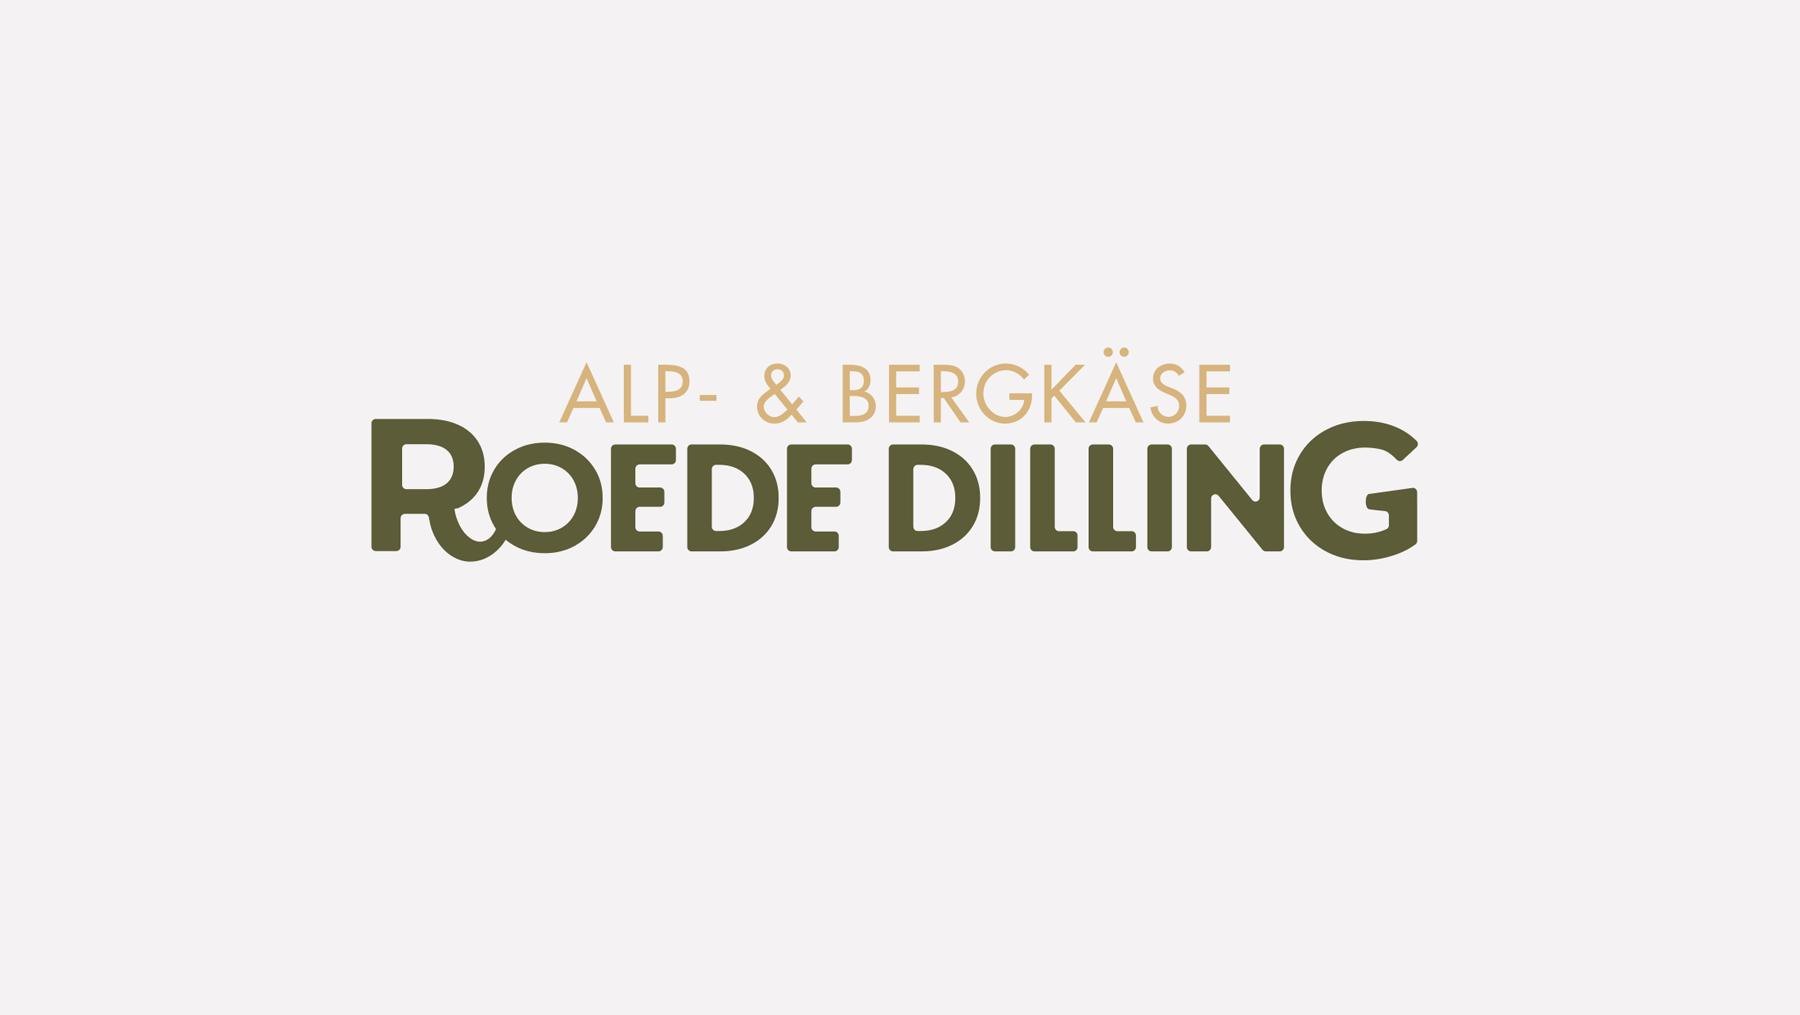 Logo-Roede-Dilling-Alp-Bergkaese